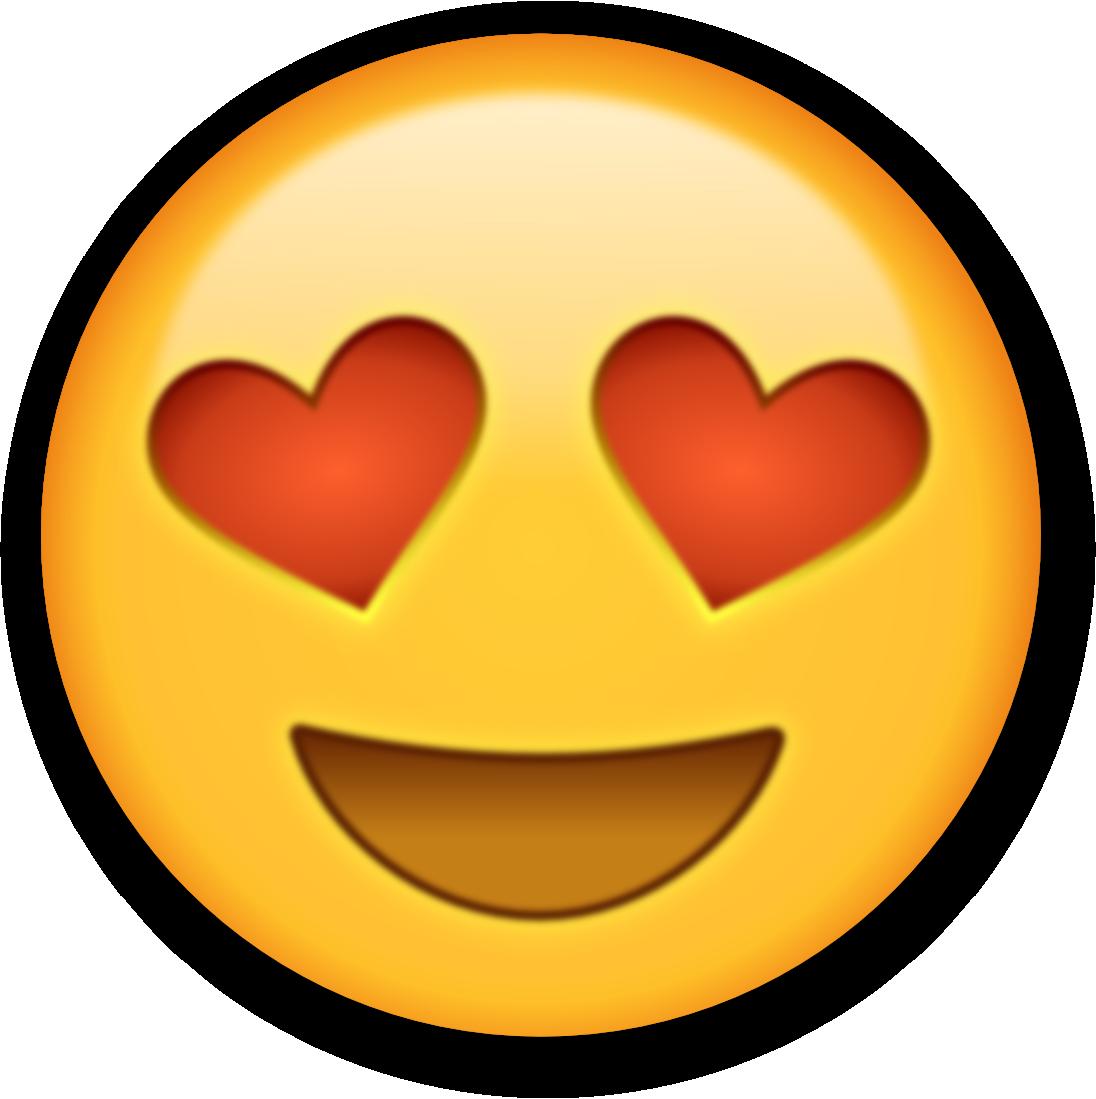 Kiss clipart iphone emoji #1